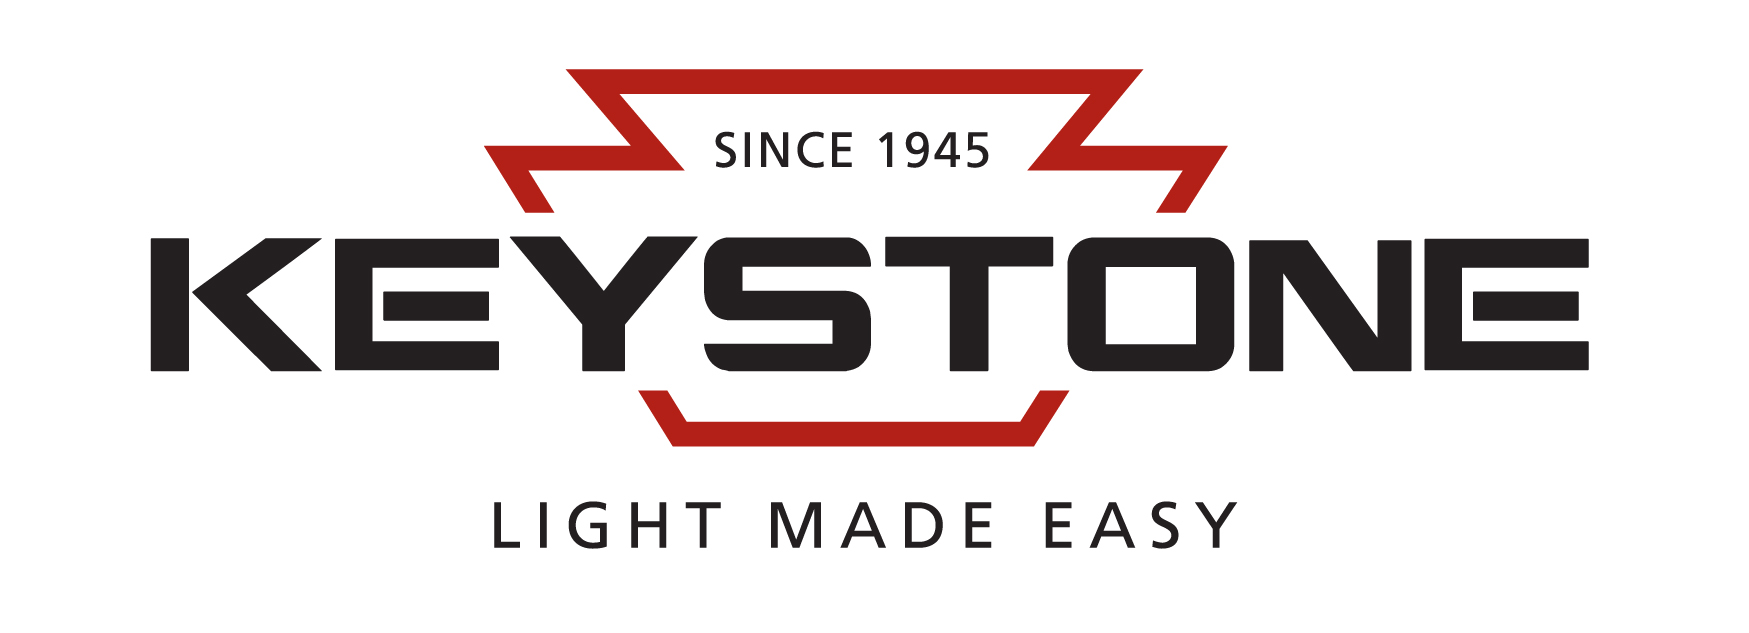 Keystone Xpander LED - rileyelectricalsupply.com